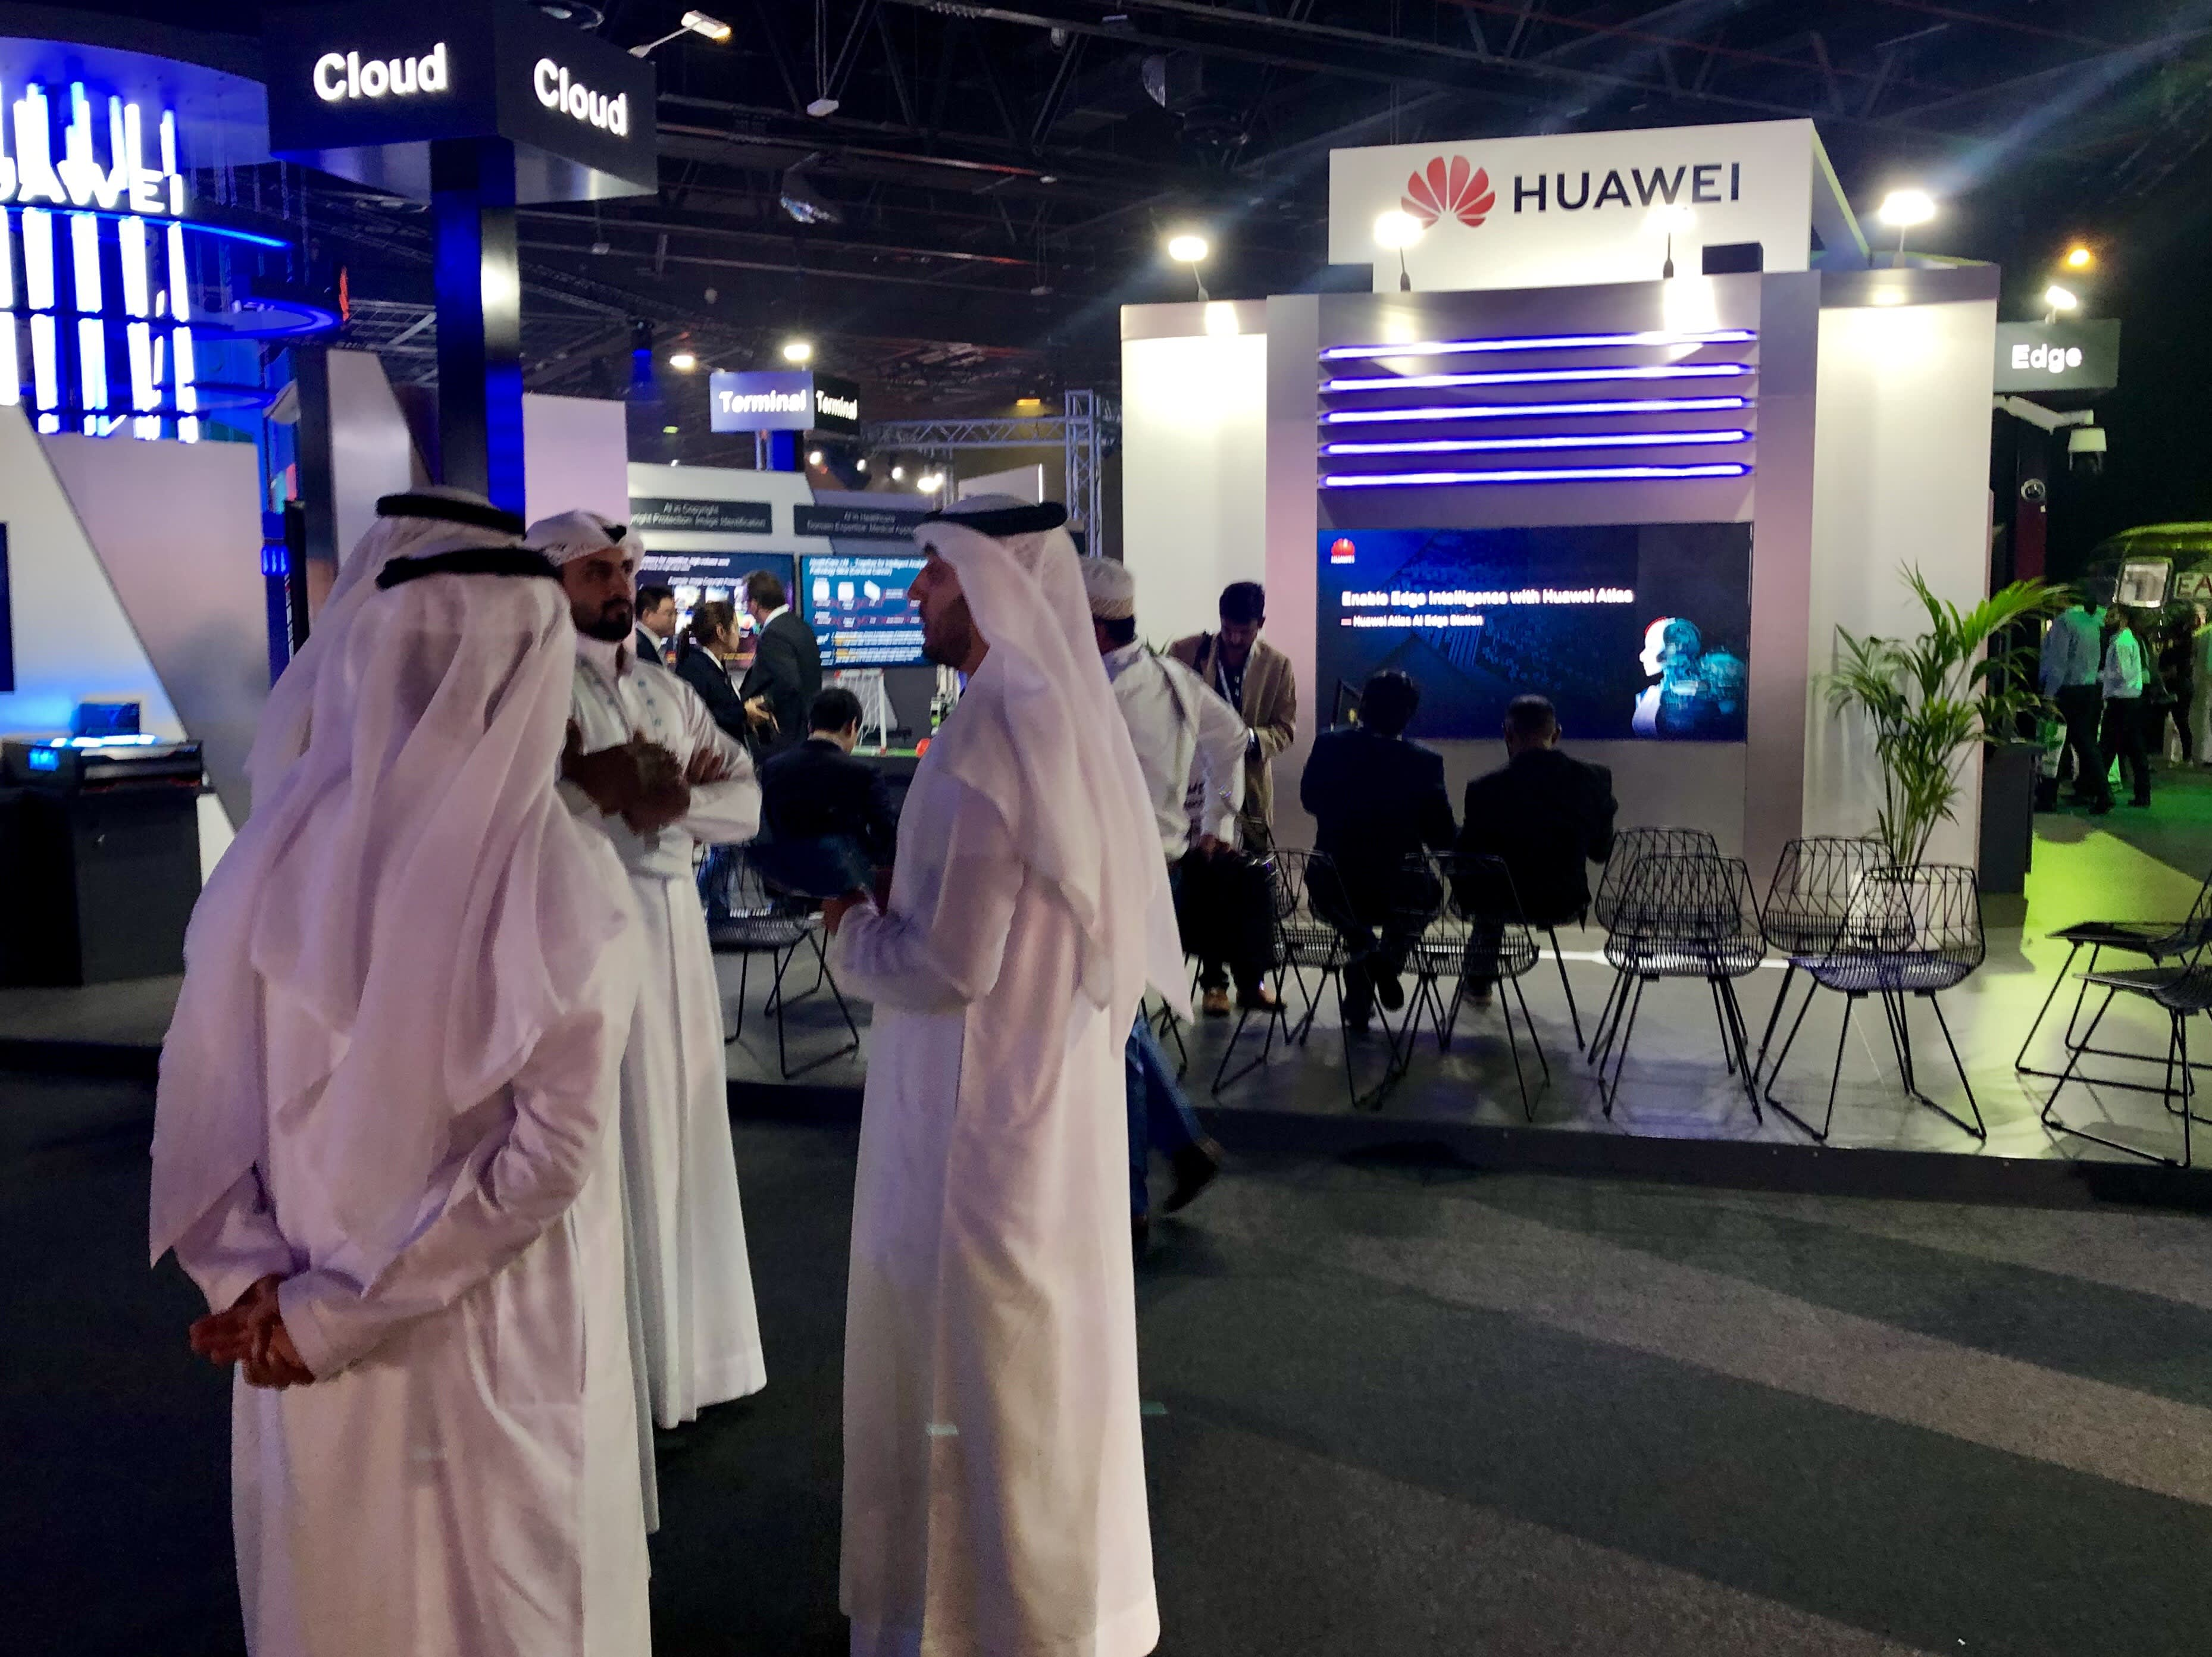 America's Huawei fight is of no concern to the UAE, Dubai A.I. executive says